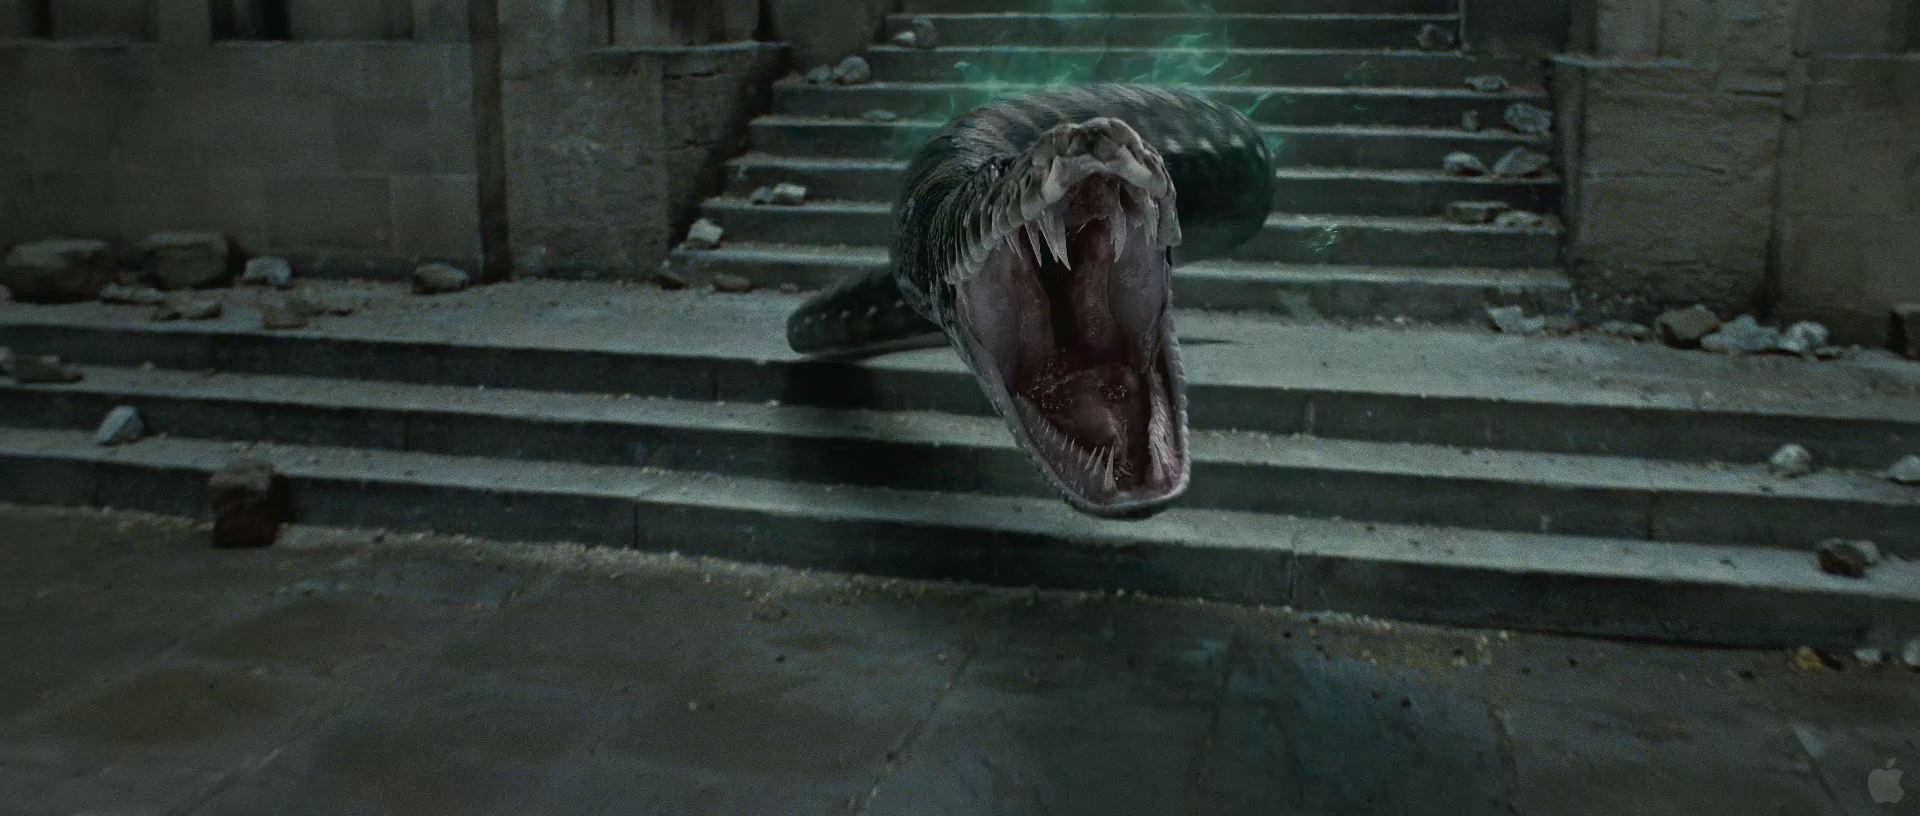 Harry Potter BlogHogwarts HP7 2 Trailer 46